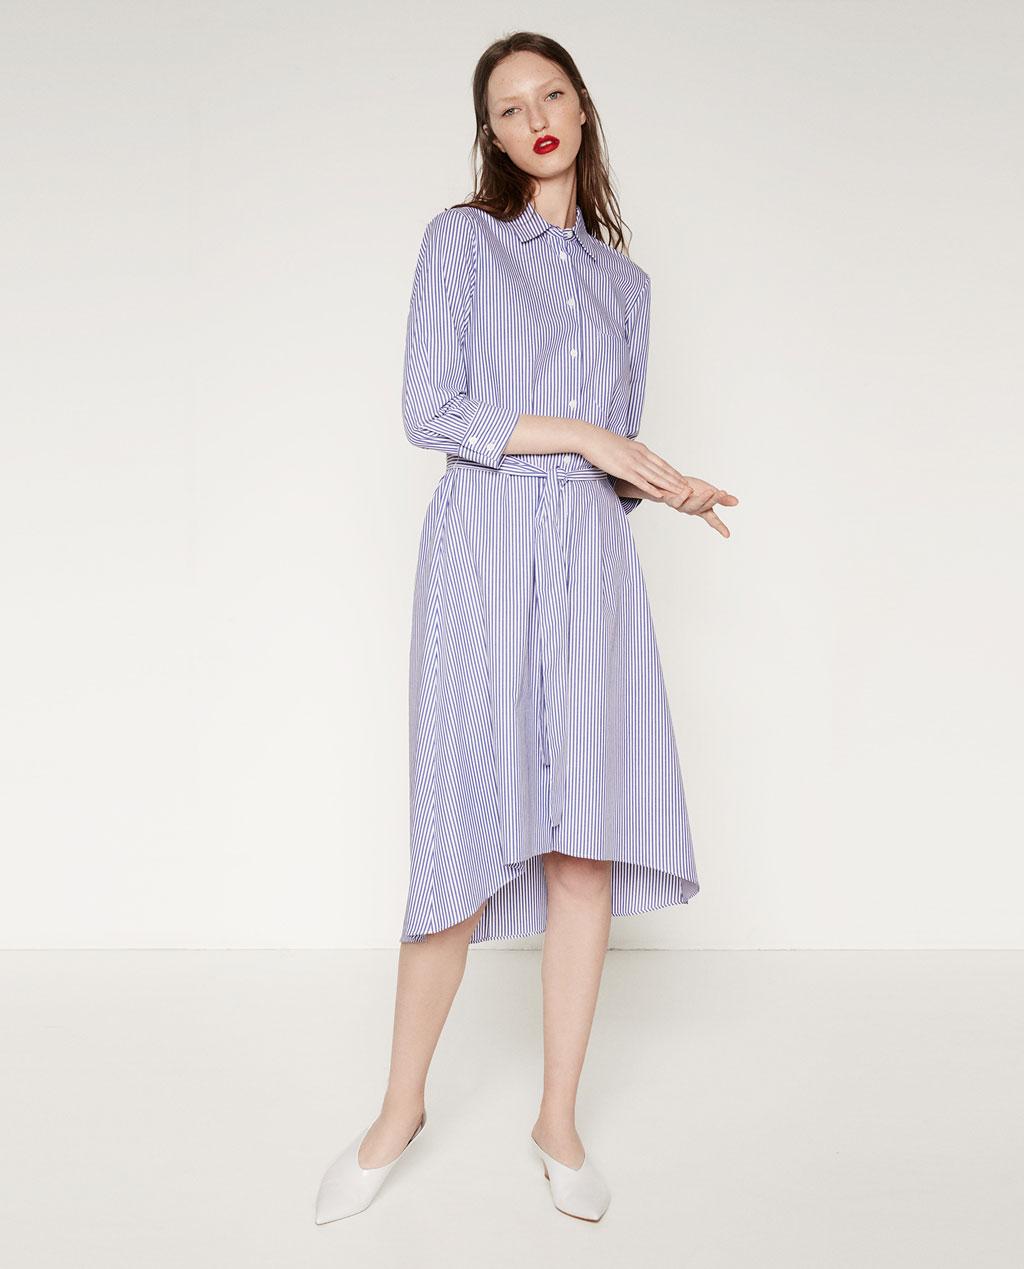 The Striped Shirtdress, Zara - £44.99